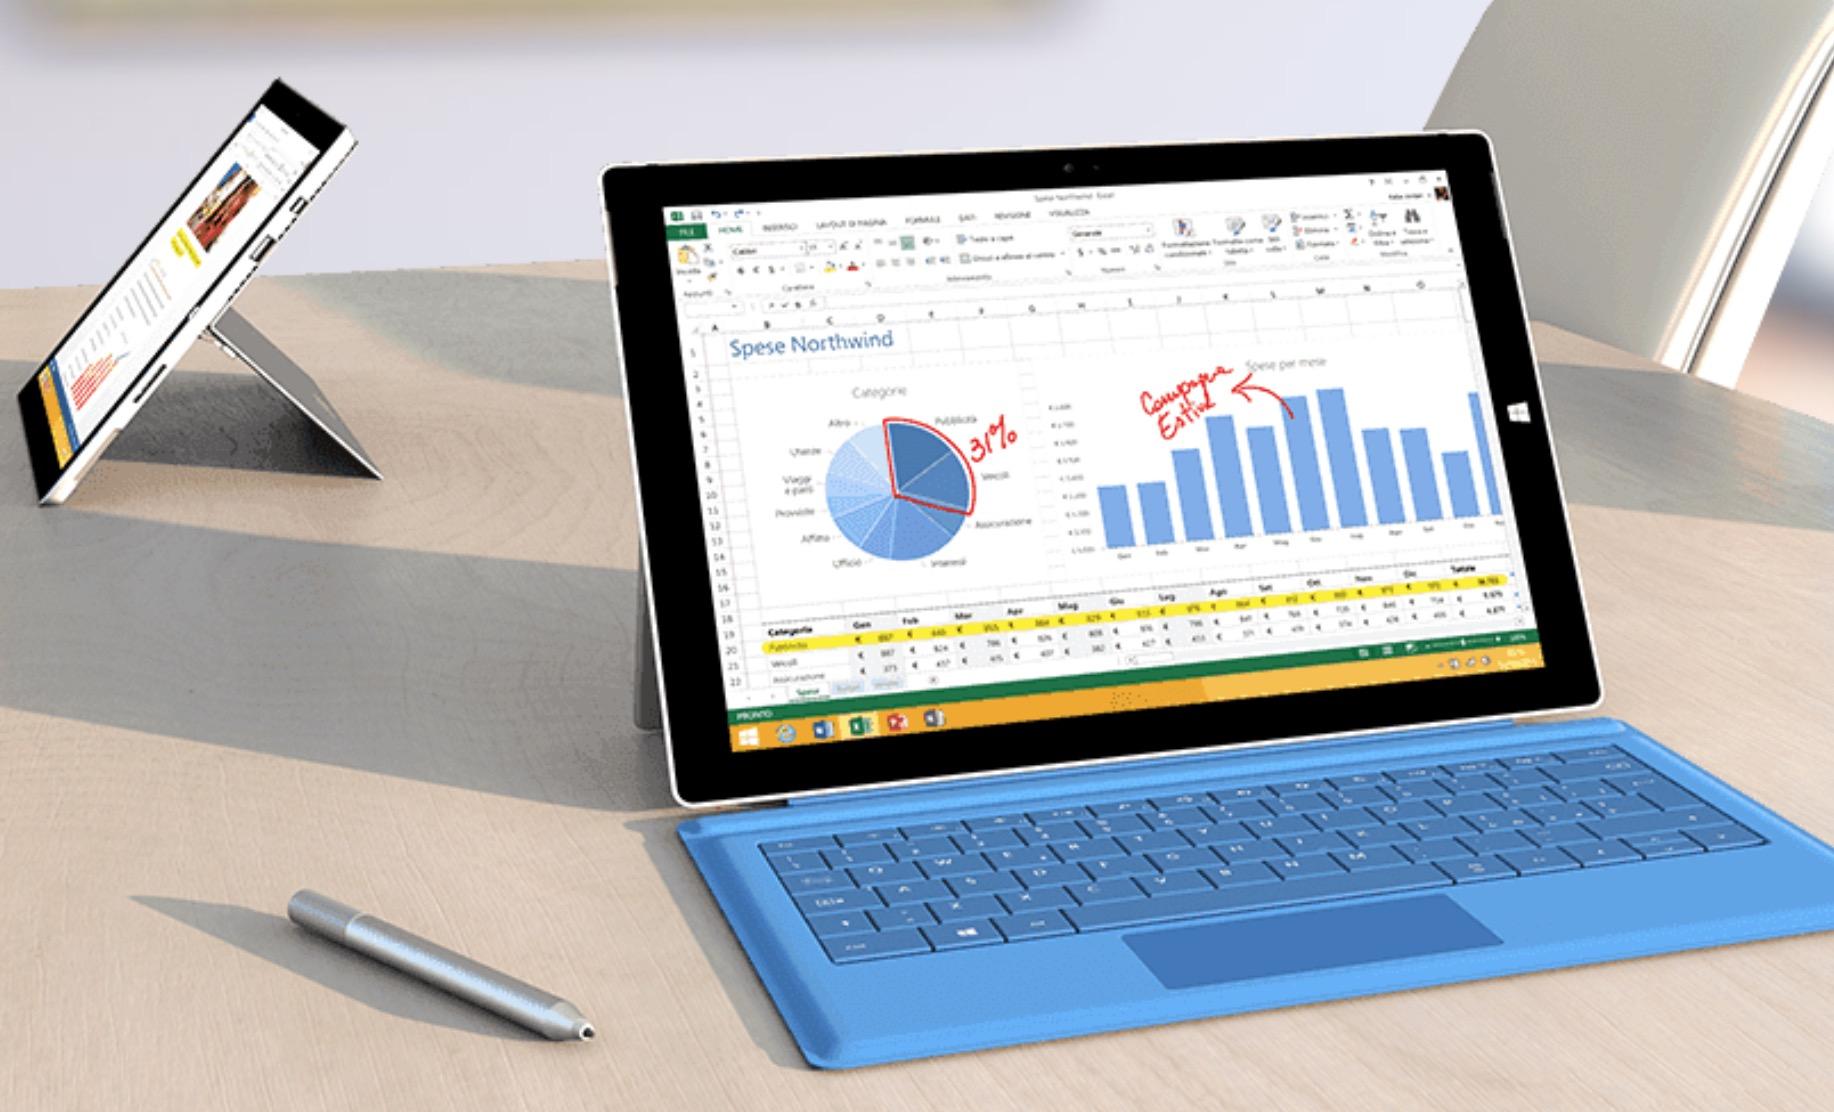 Display Microsoft Surface